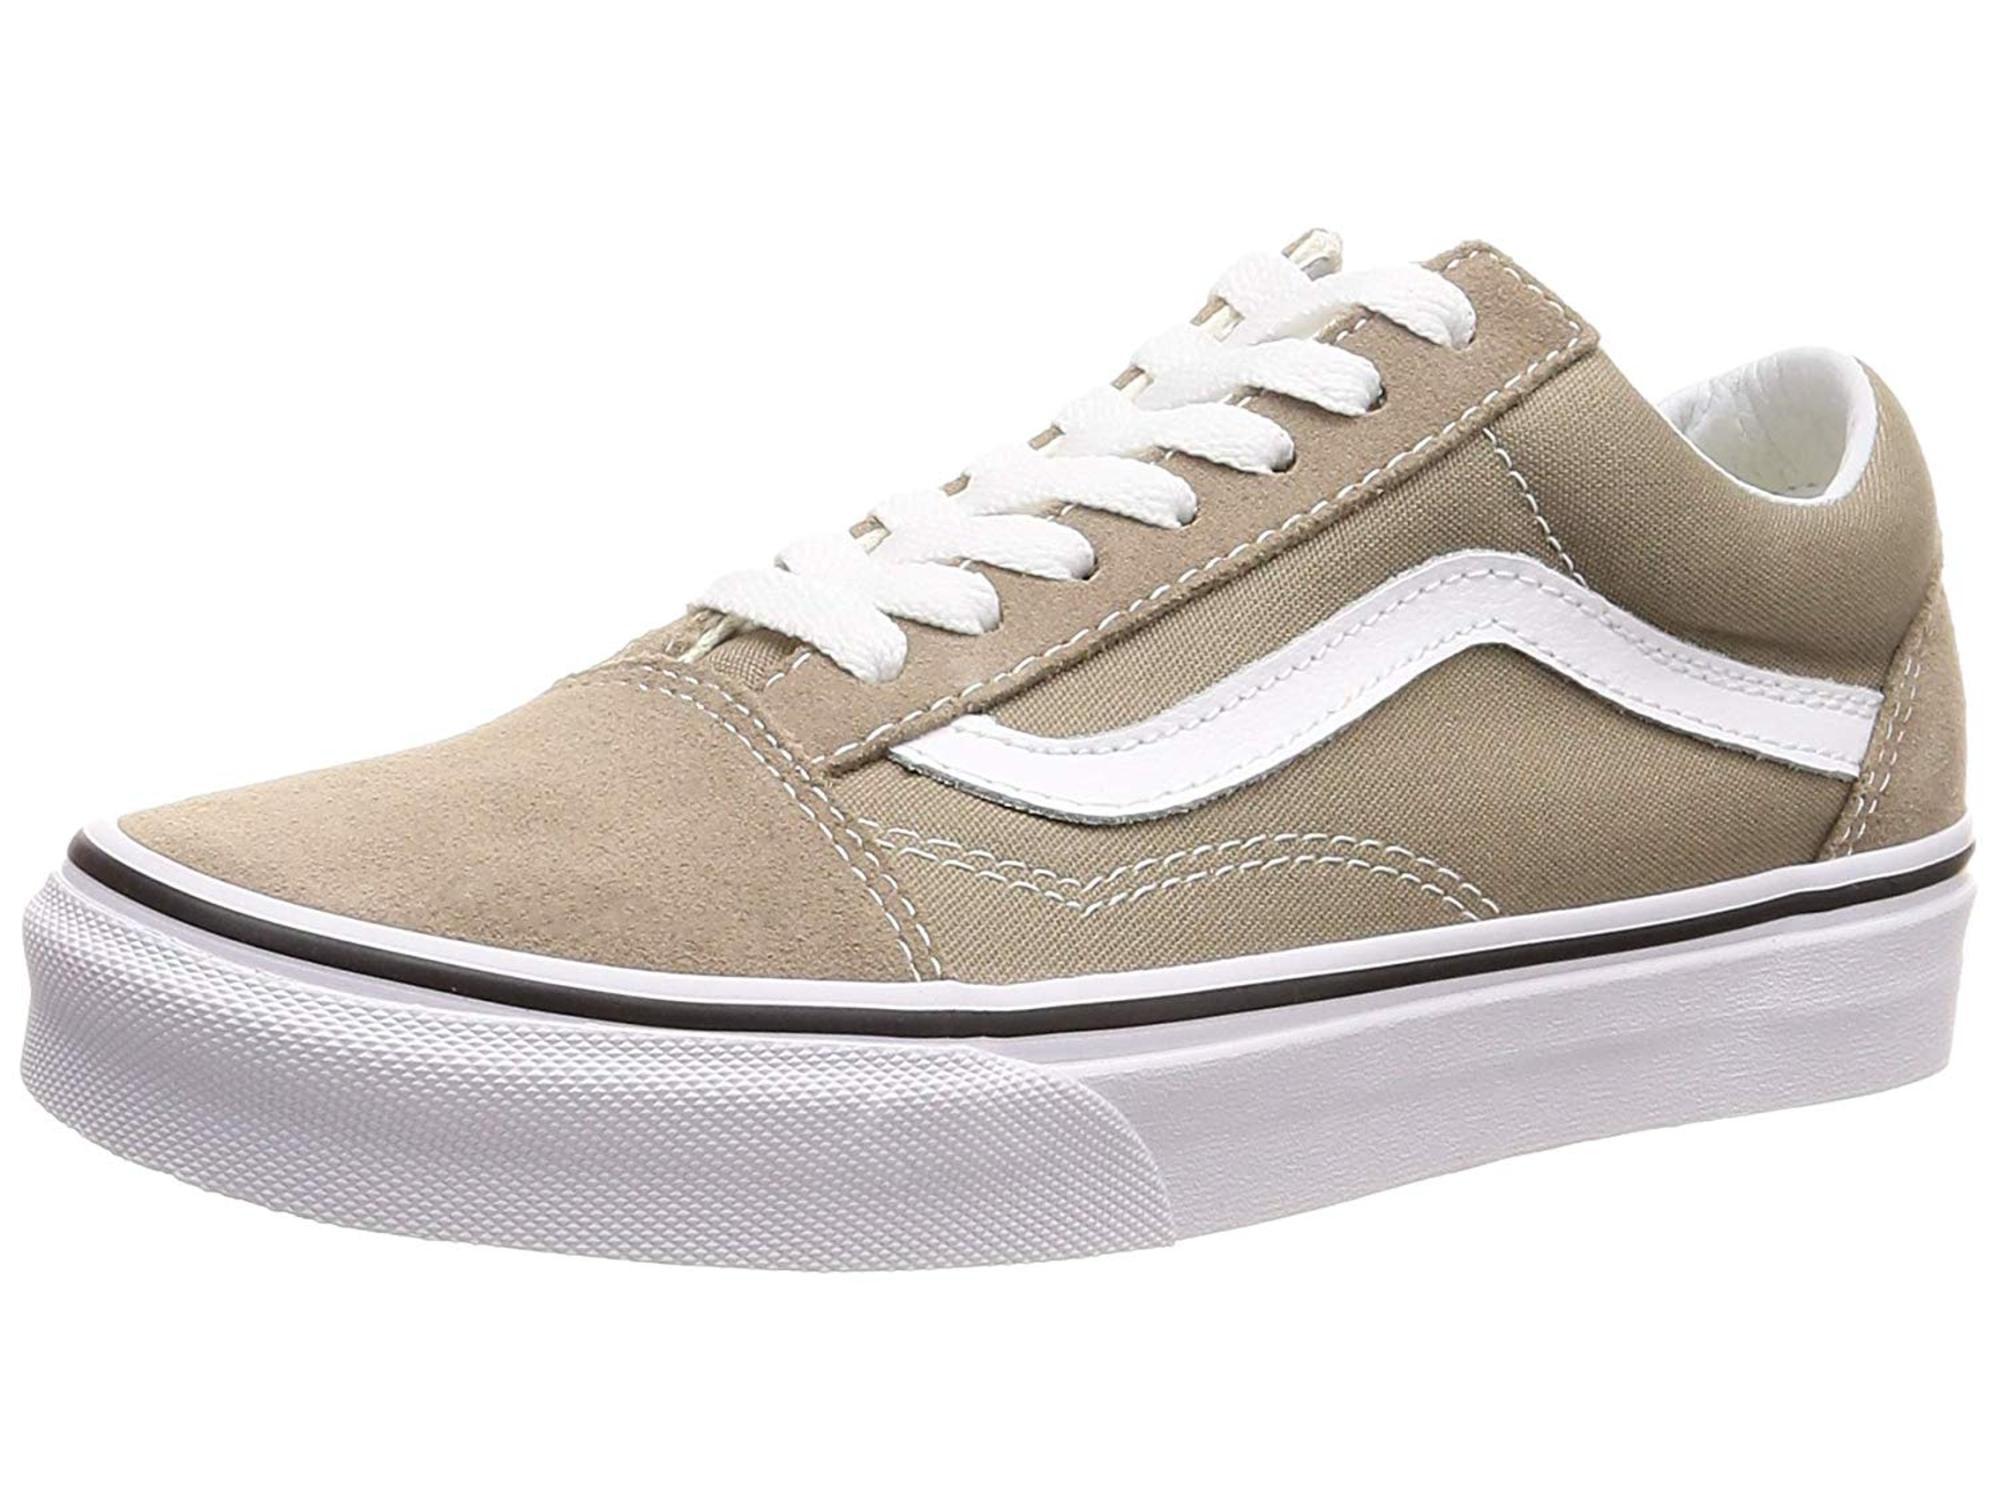 Vans Womens Old Skool Sneaker, Desert